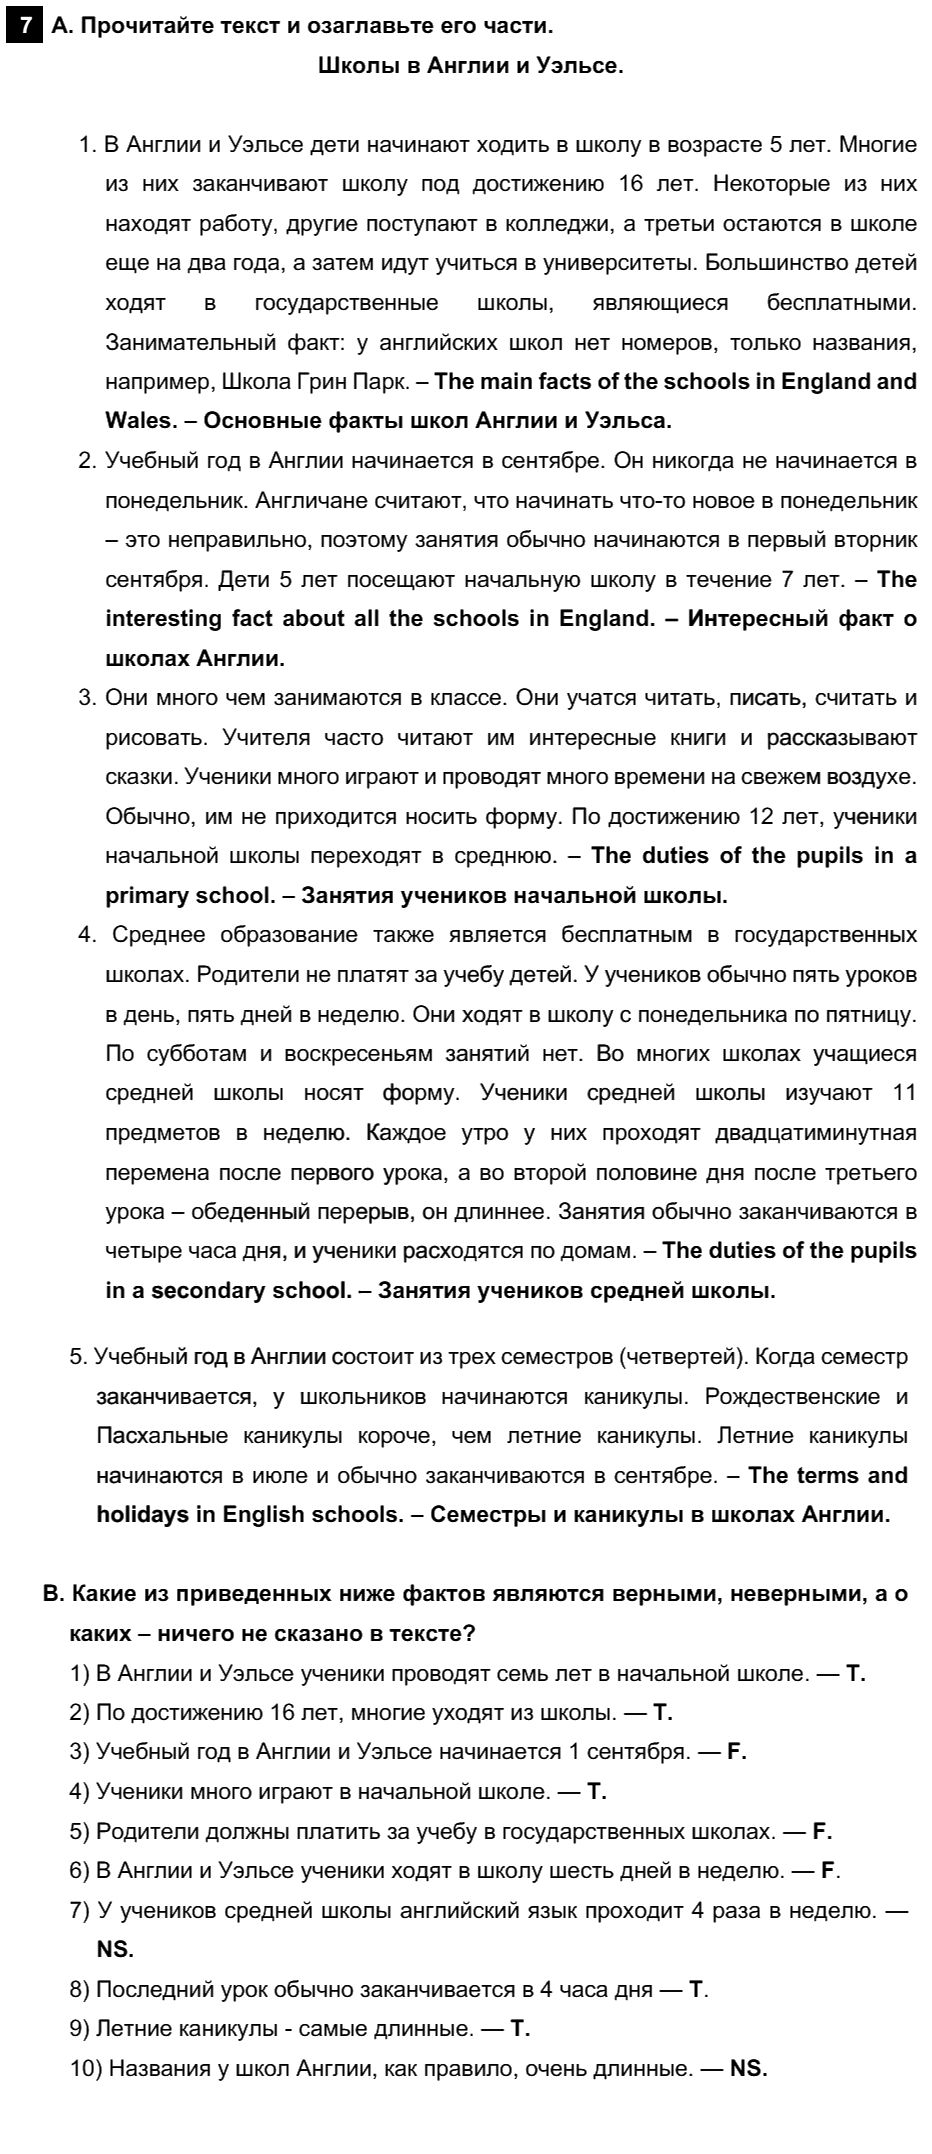 Английский язык 7 класс Афанасьева О. В. Unit 1. Школа и учёба / Шаг 4: 7